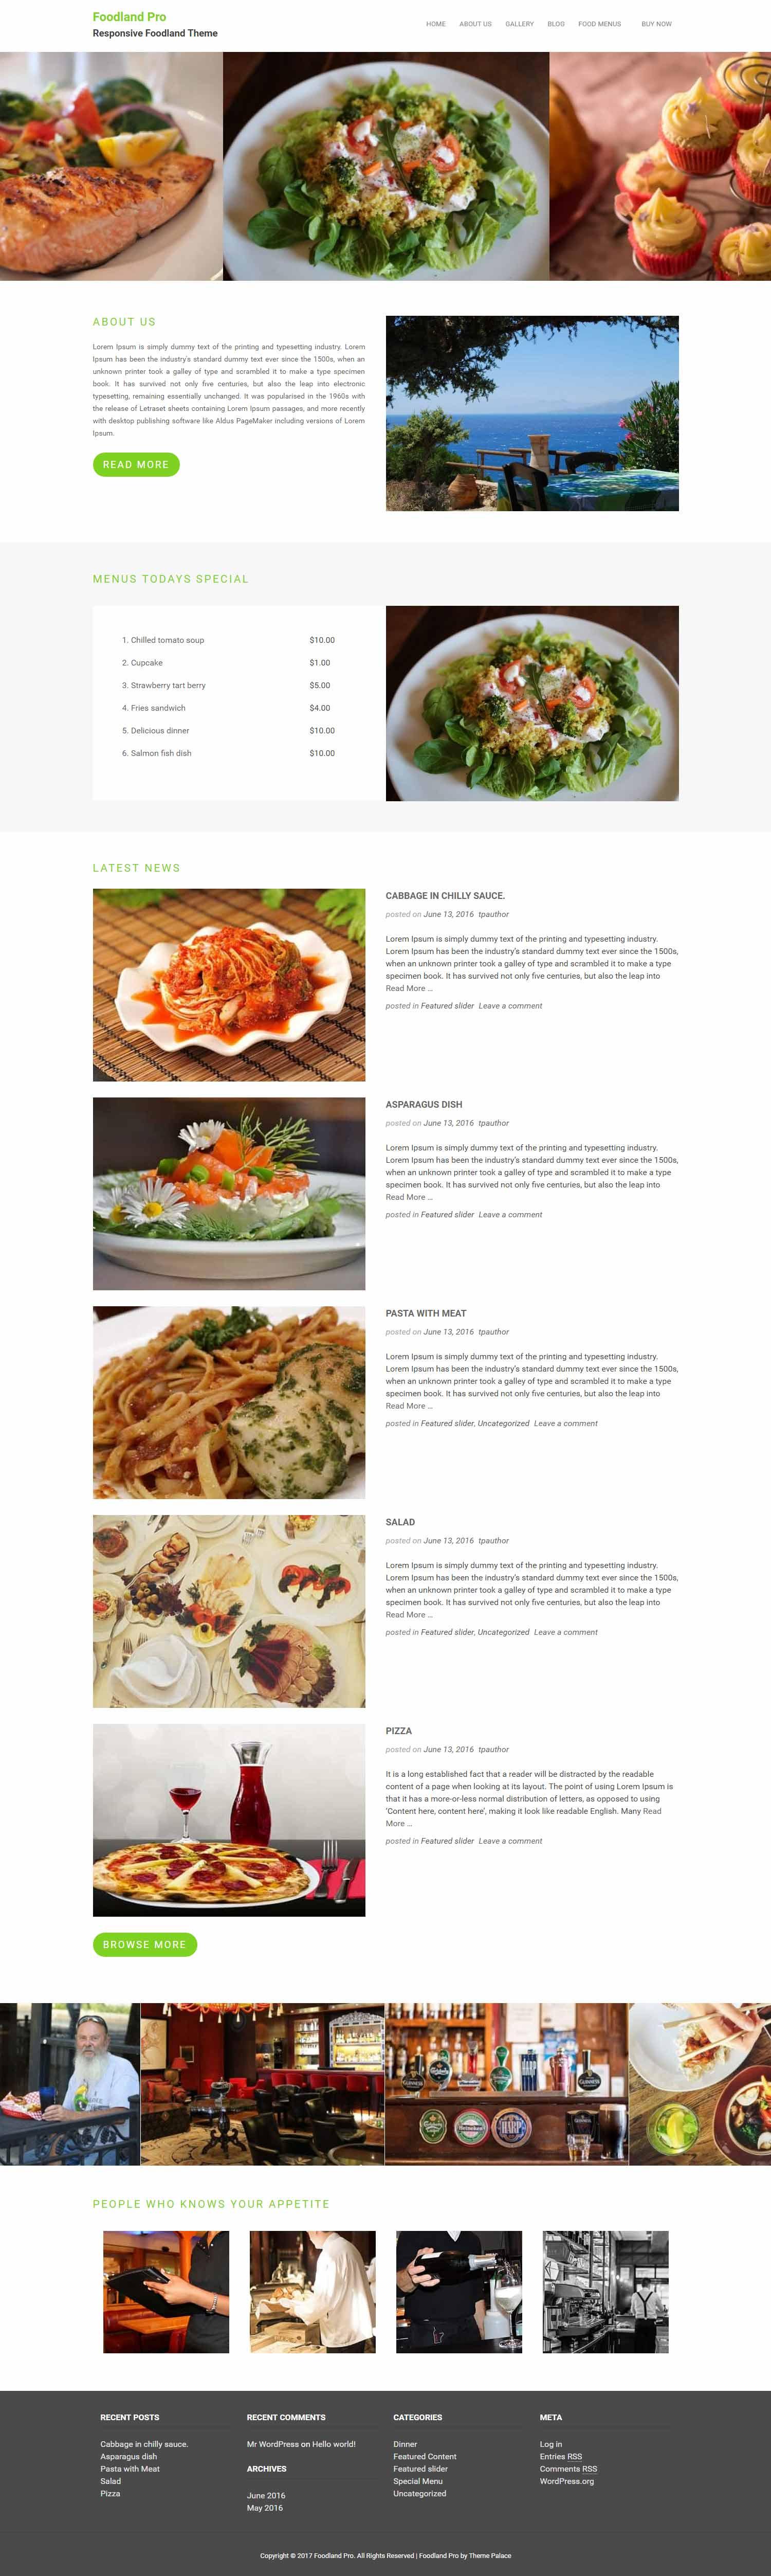 Foodland Pro